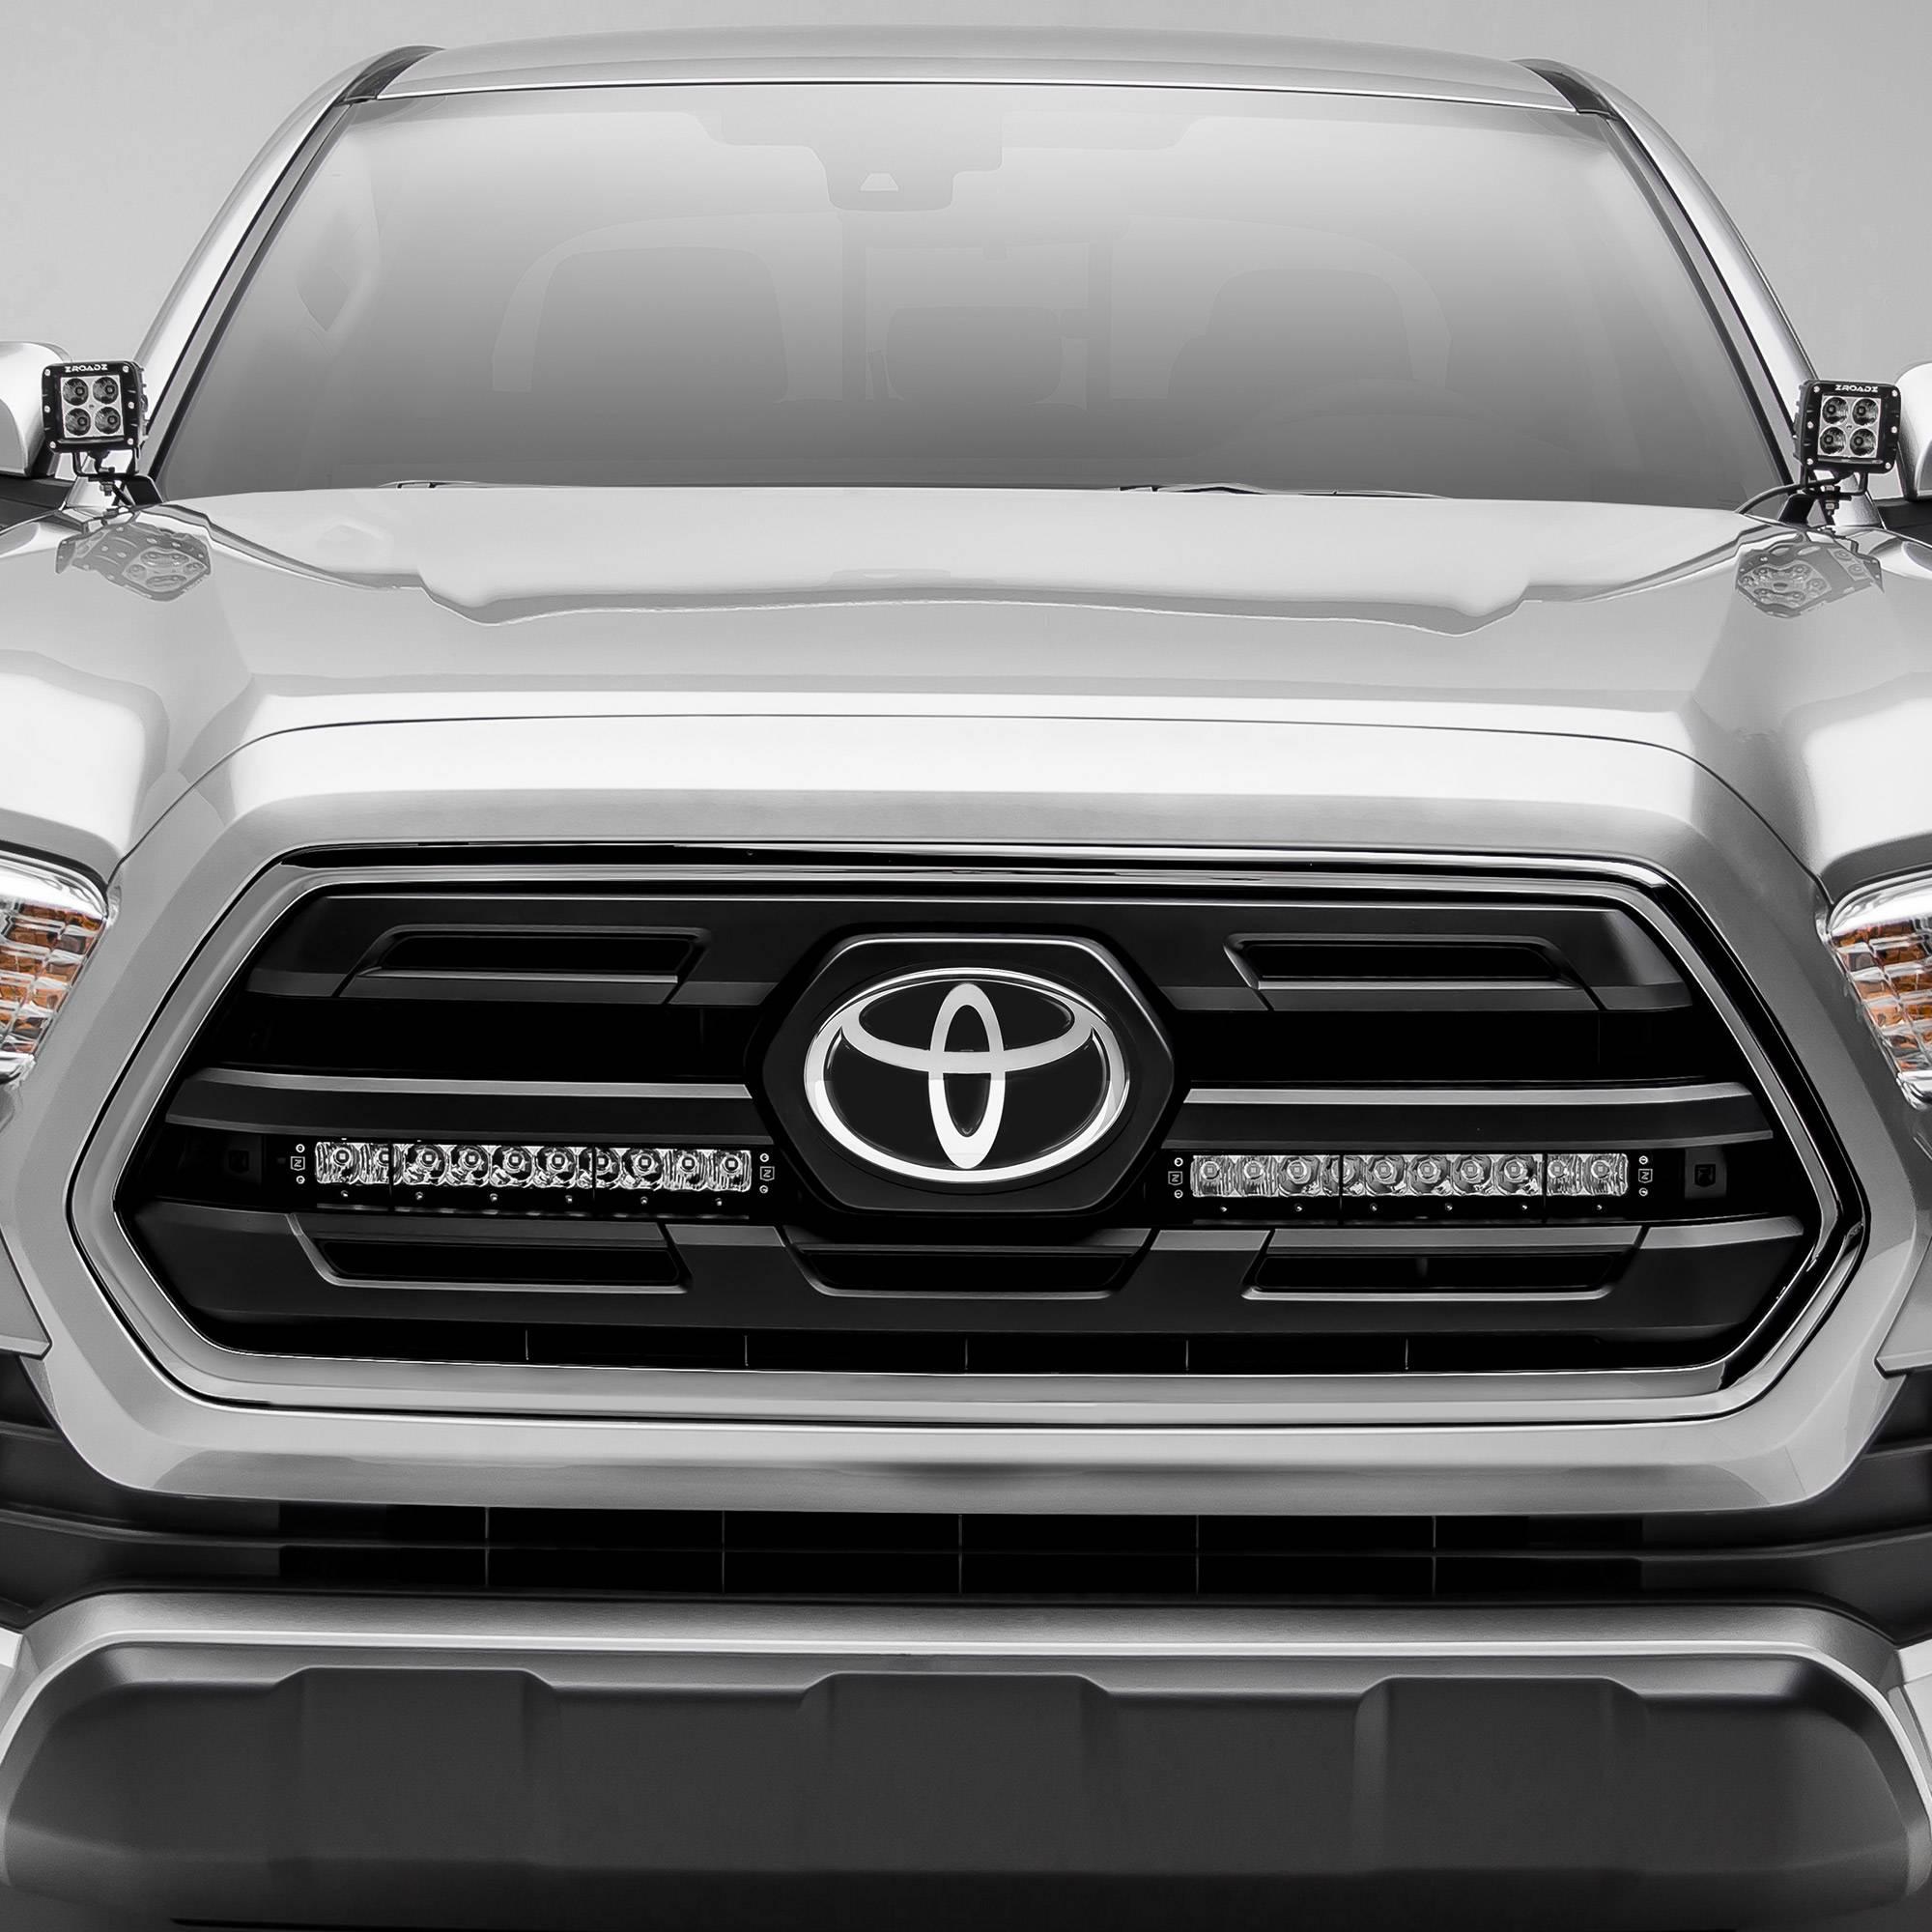 ZROADZ OFF ROAD PRODUCTS - 2018-2019 Toyota Tacoma OEM Grille LED Kit with (2) 10 Inch LED Single Row Slim Light Bars - PN #Z419611-KIT